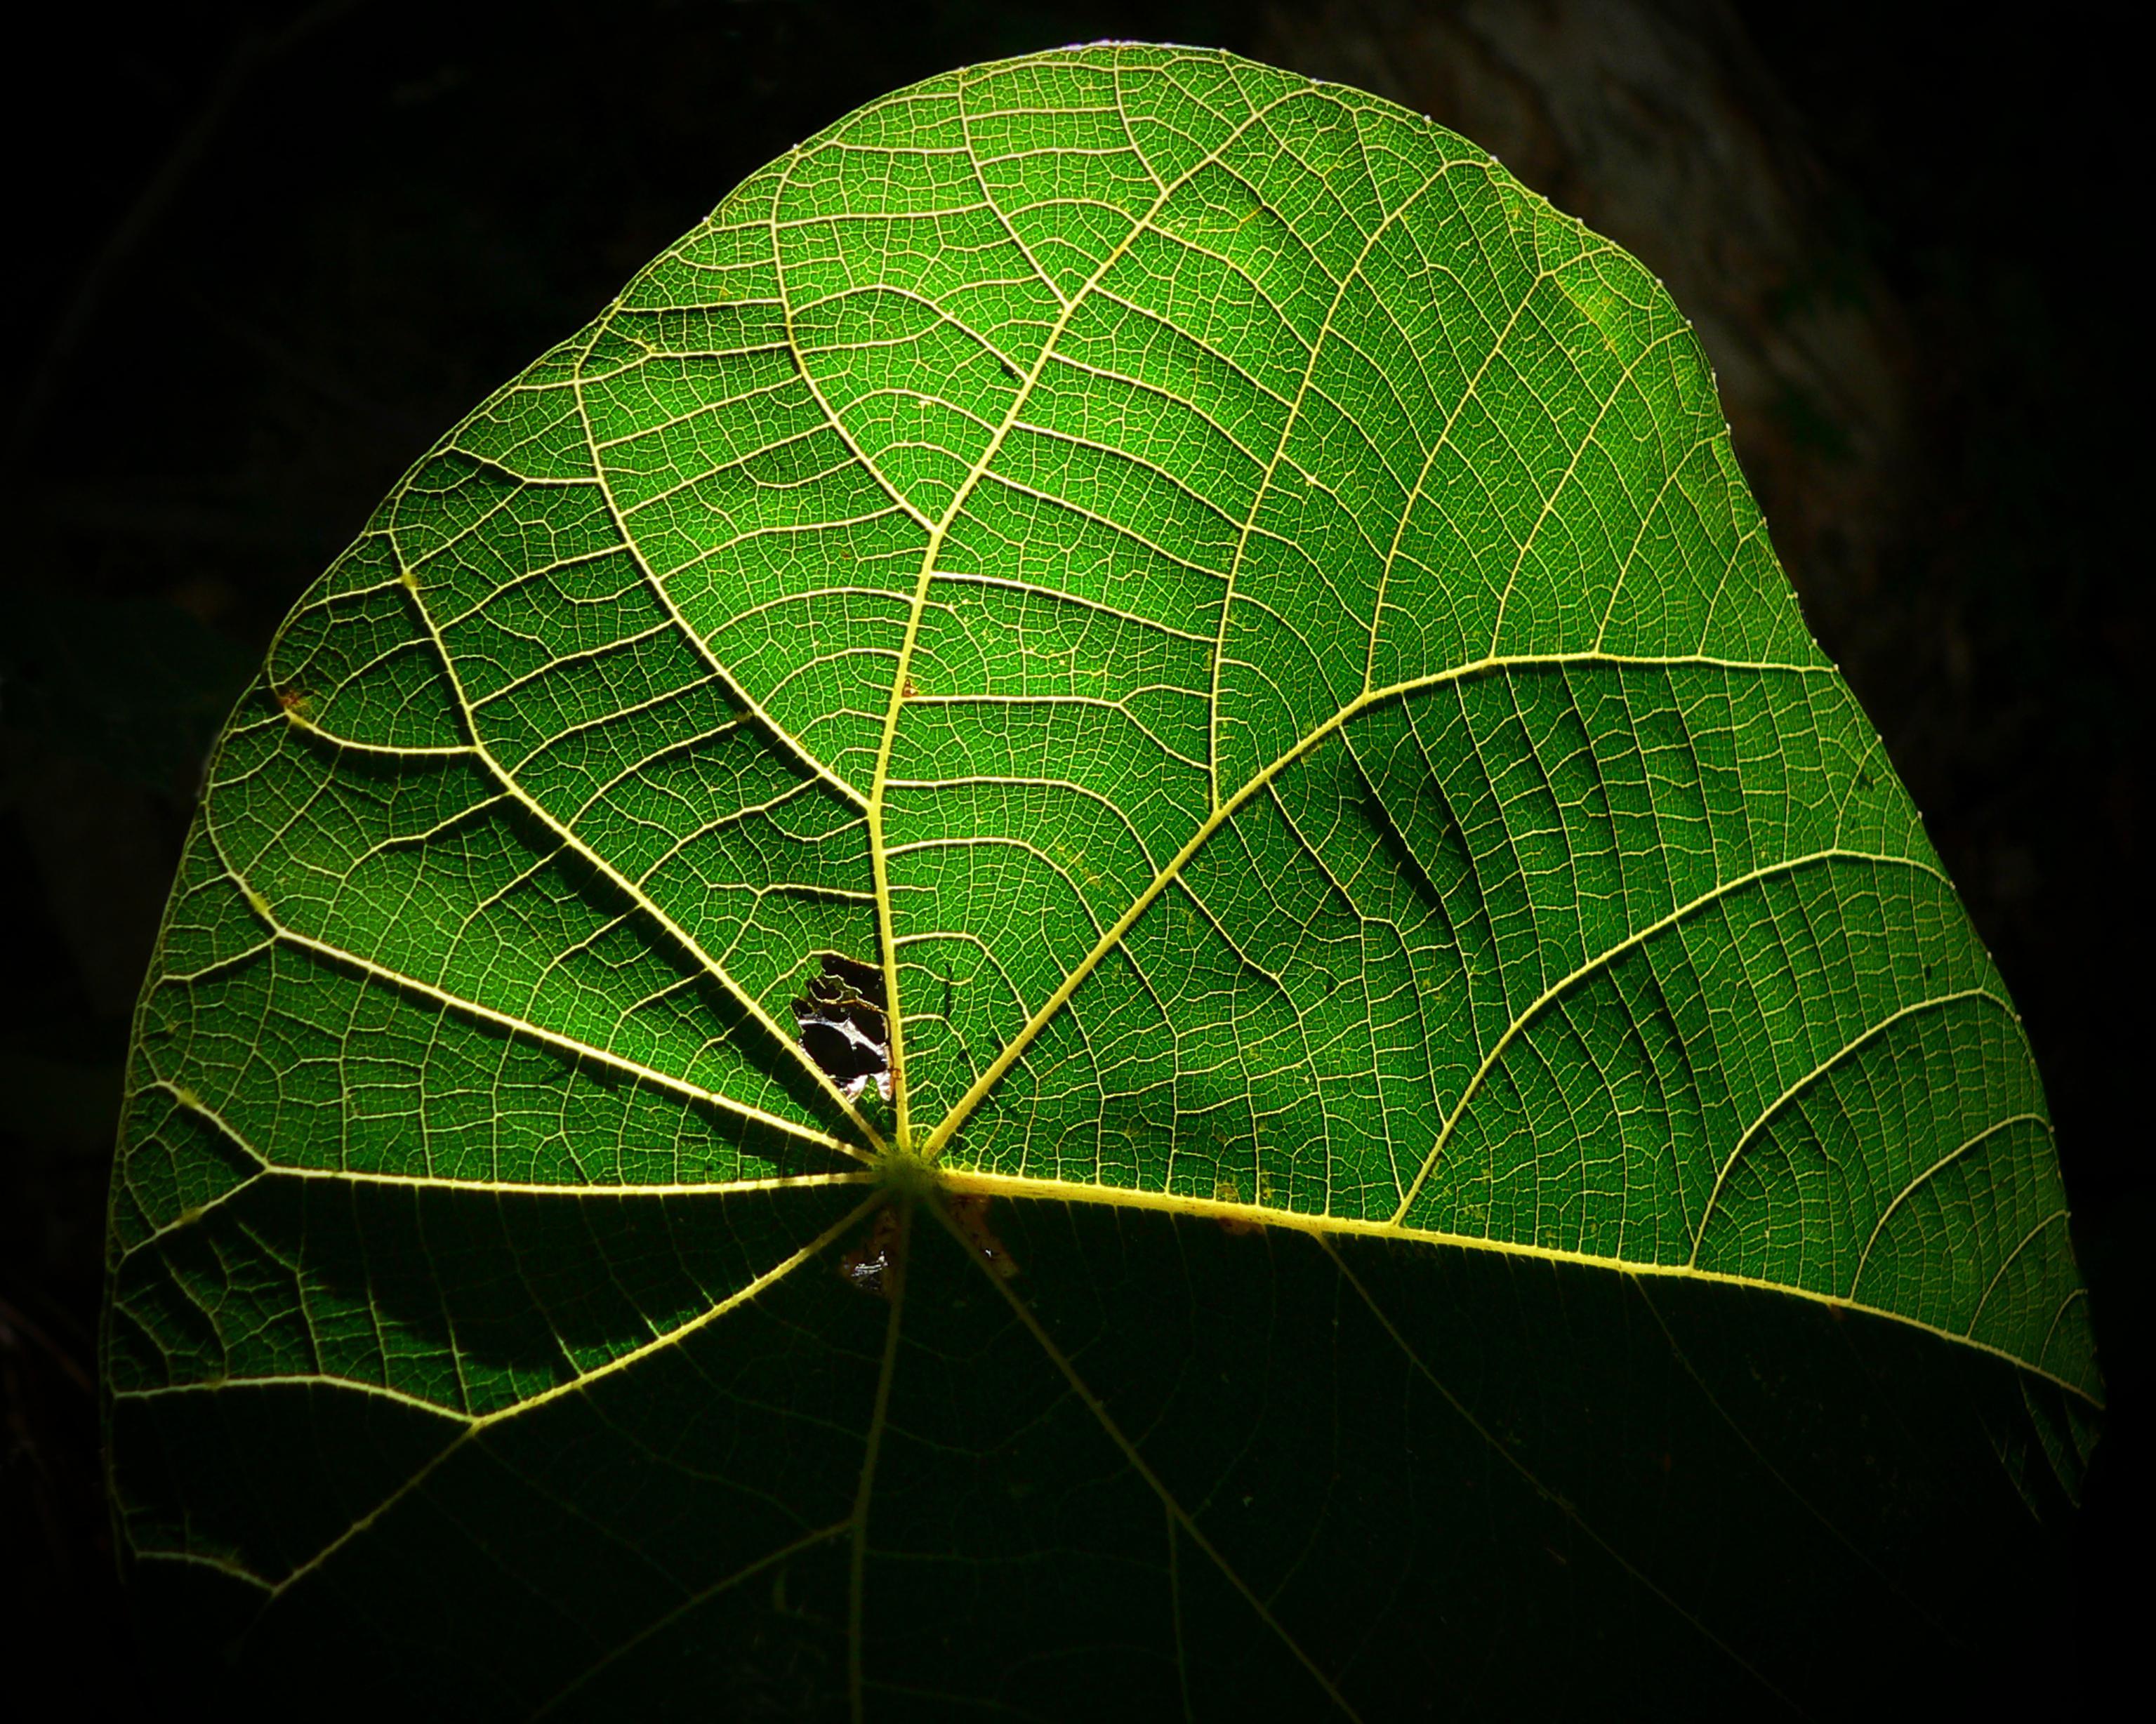 макро фото сечение листа дерева светское государство